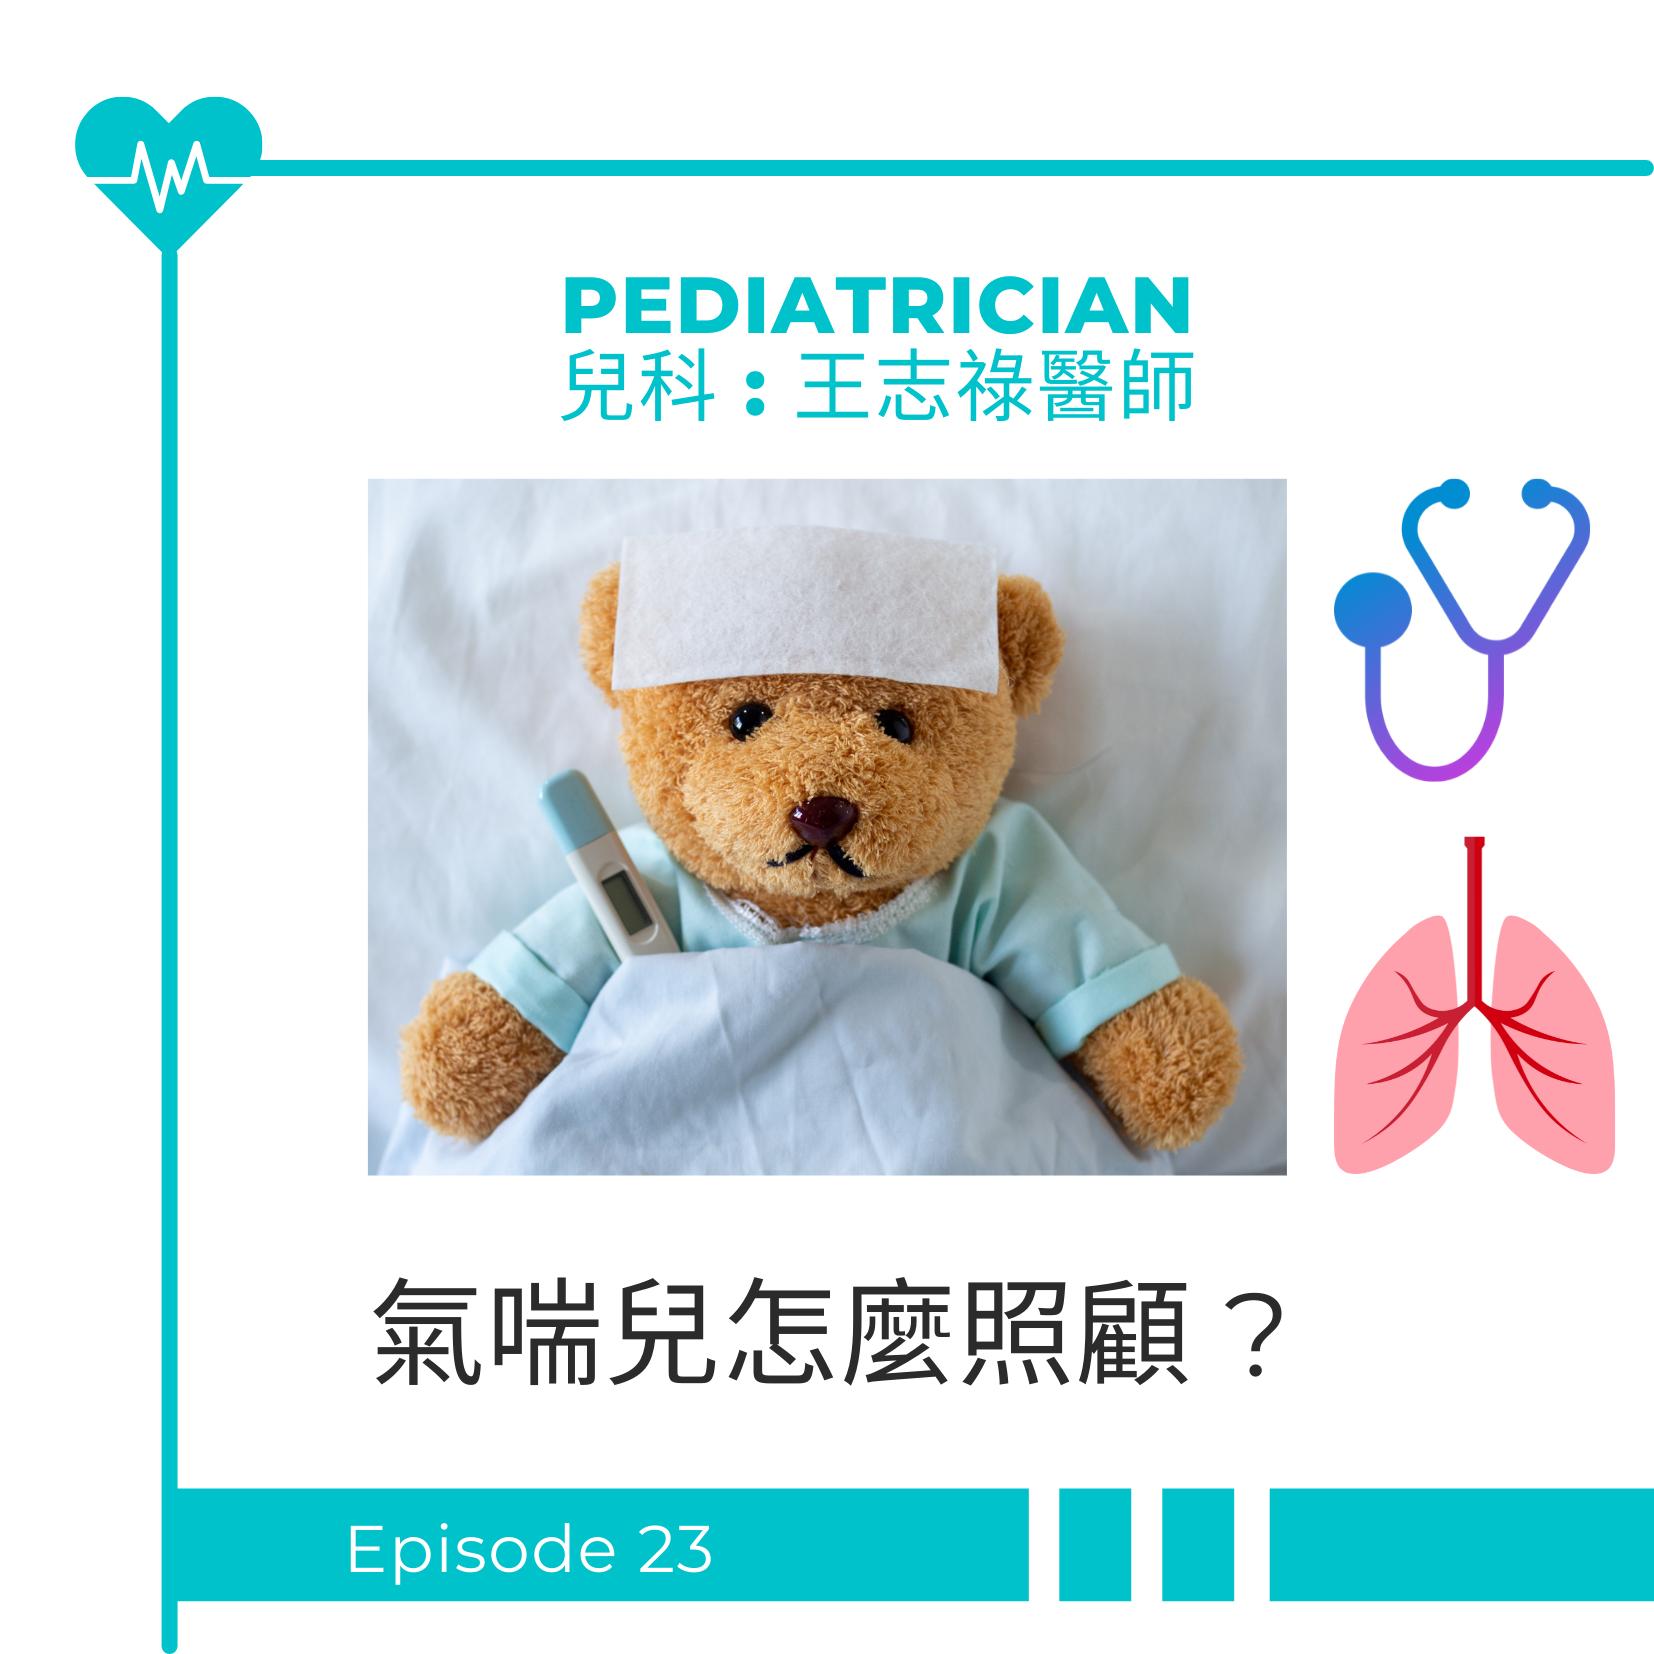 【Episode 23 : 專訪兒科 王志祿醫師】